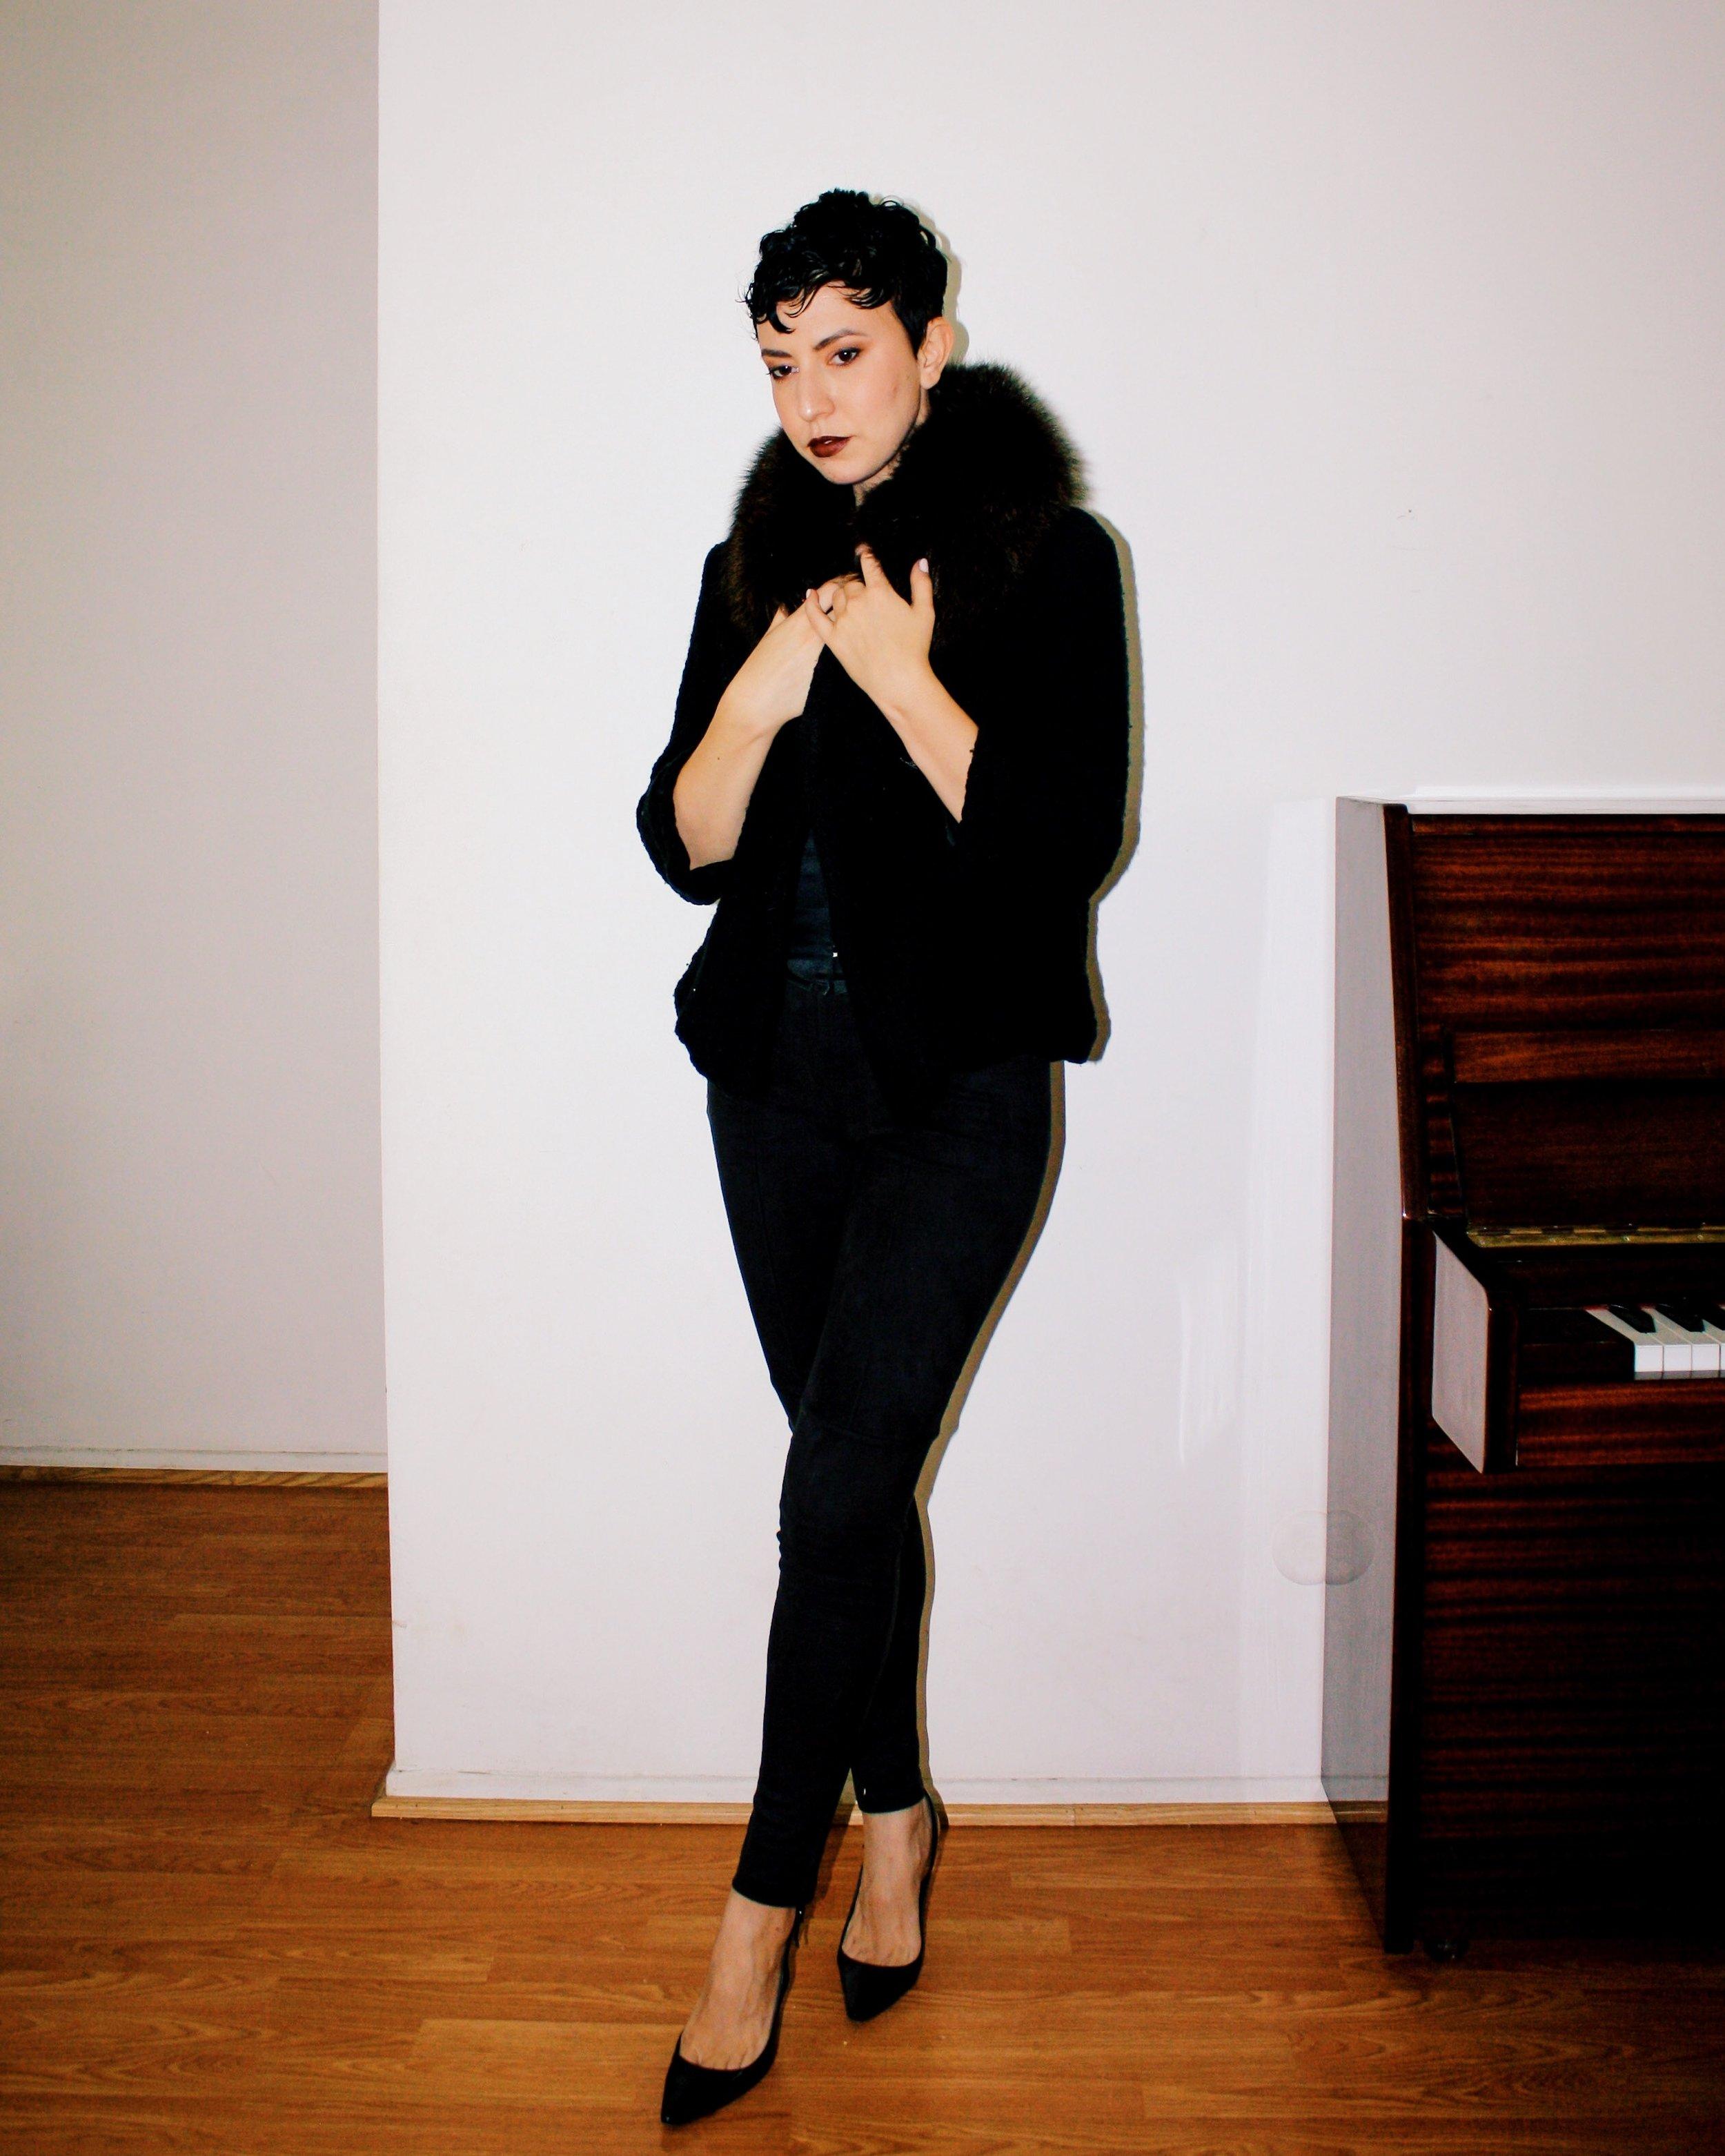 casual outfits manolo blahnik patent leather heels shoes suede pants piano white tank fur stole jacket corset belt 6